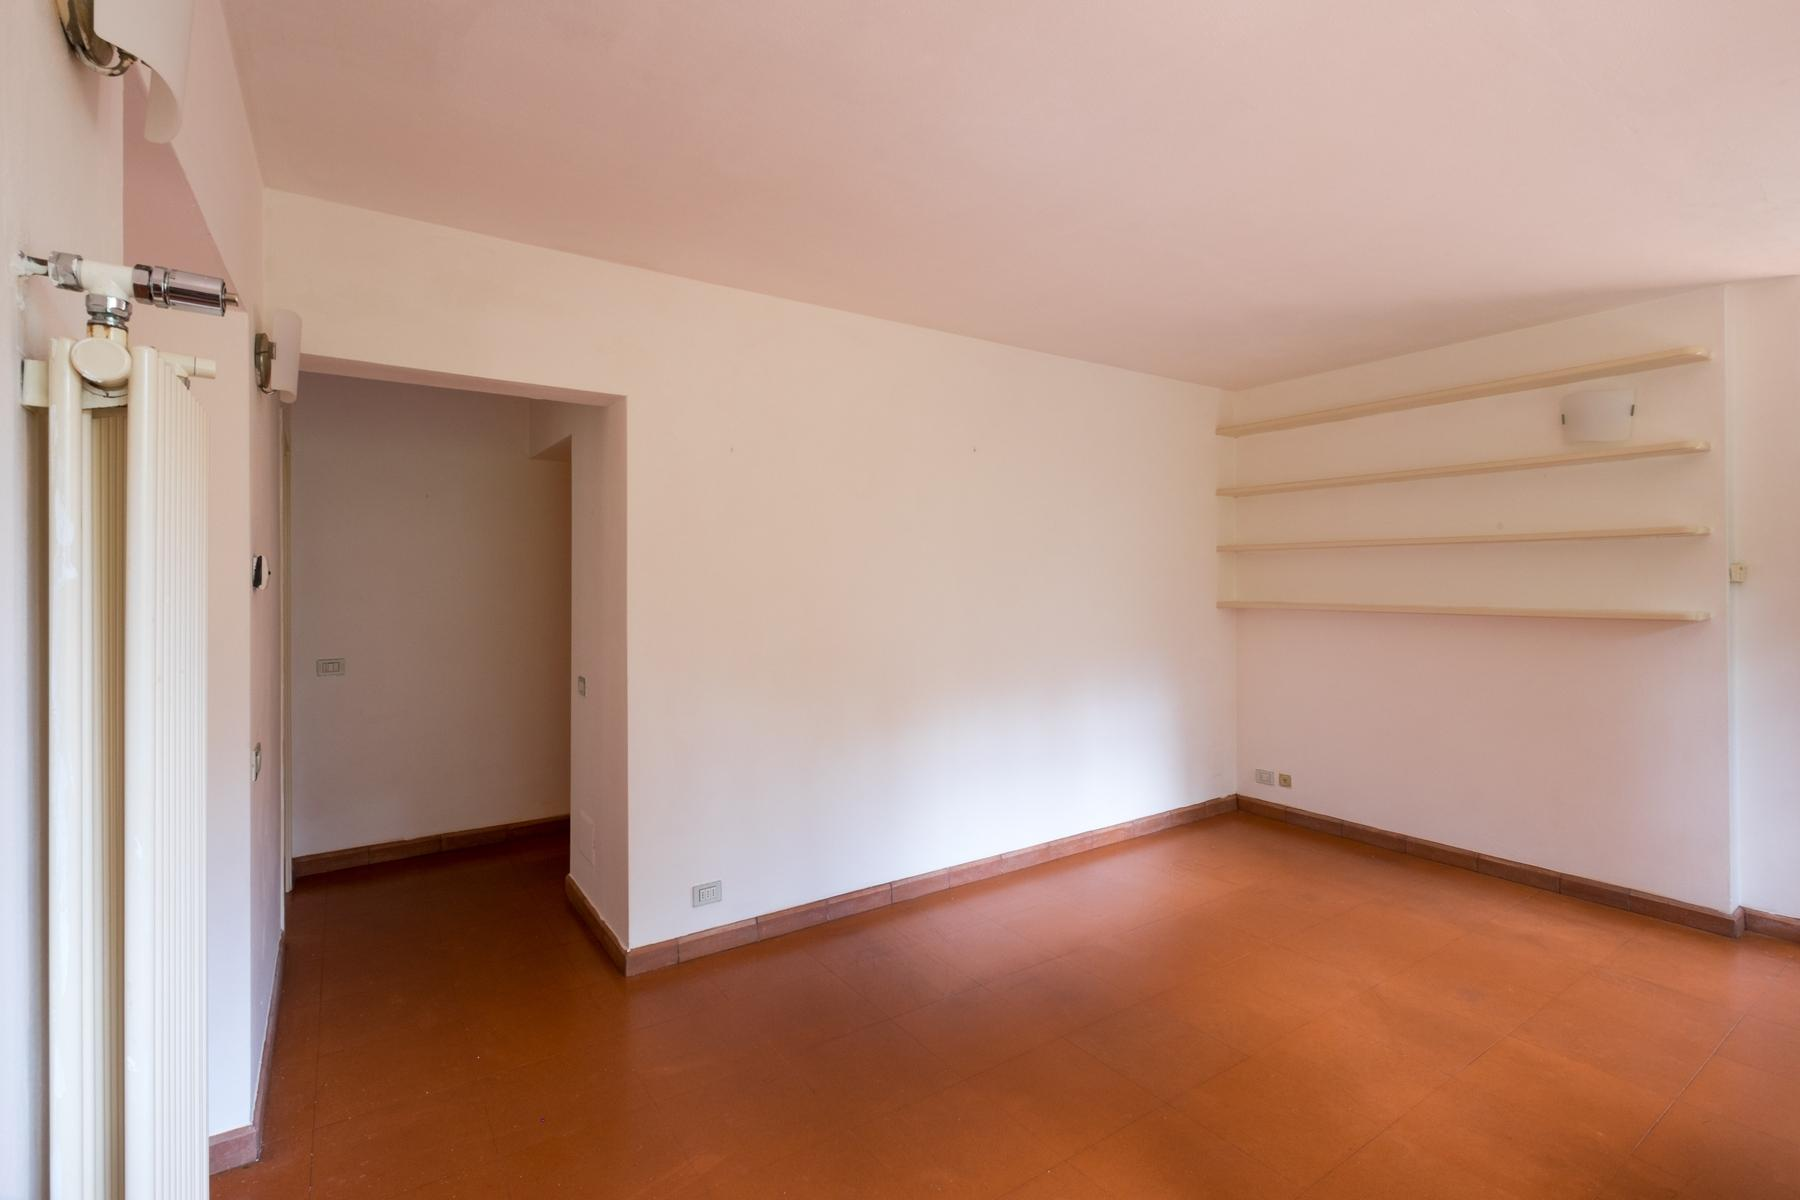 Schöne Wohnung in Poggio Imperiale - 4